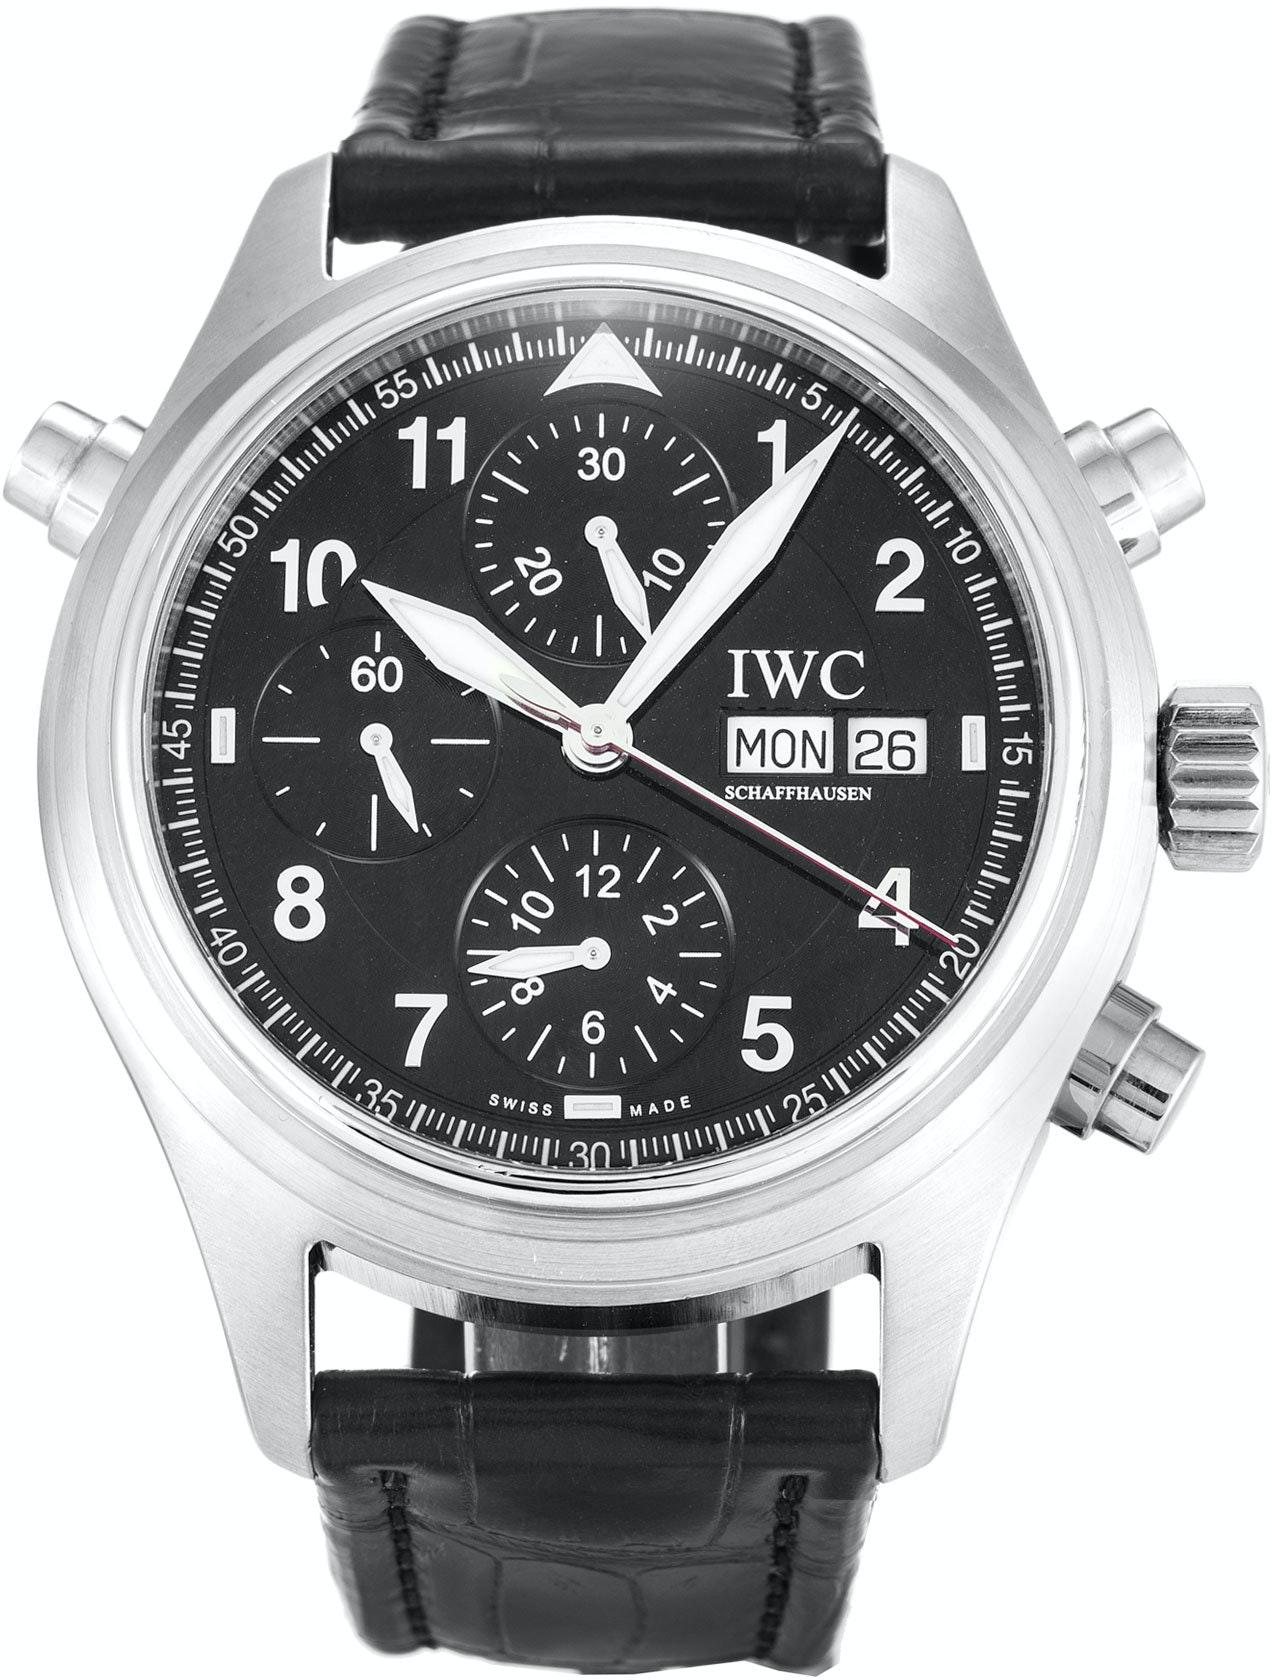 IWC Pilot Spitfire Double Chronograph IW371333